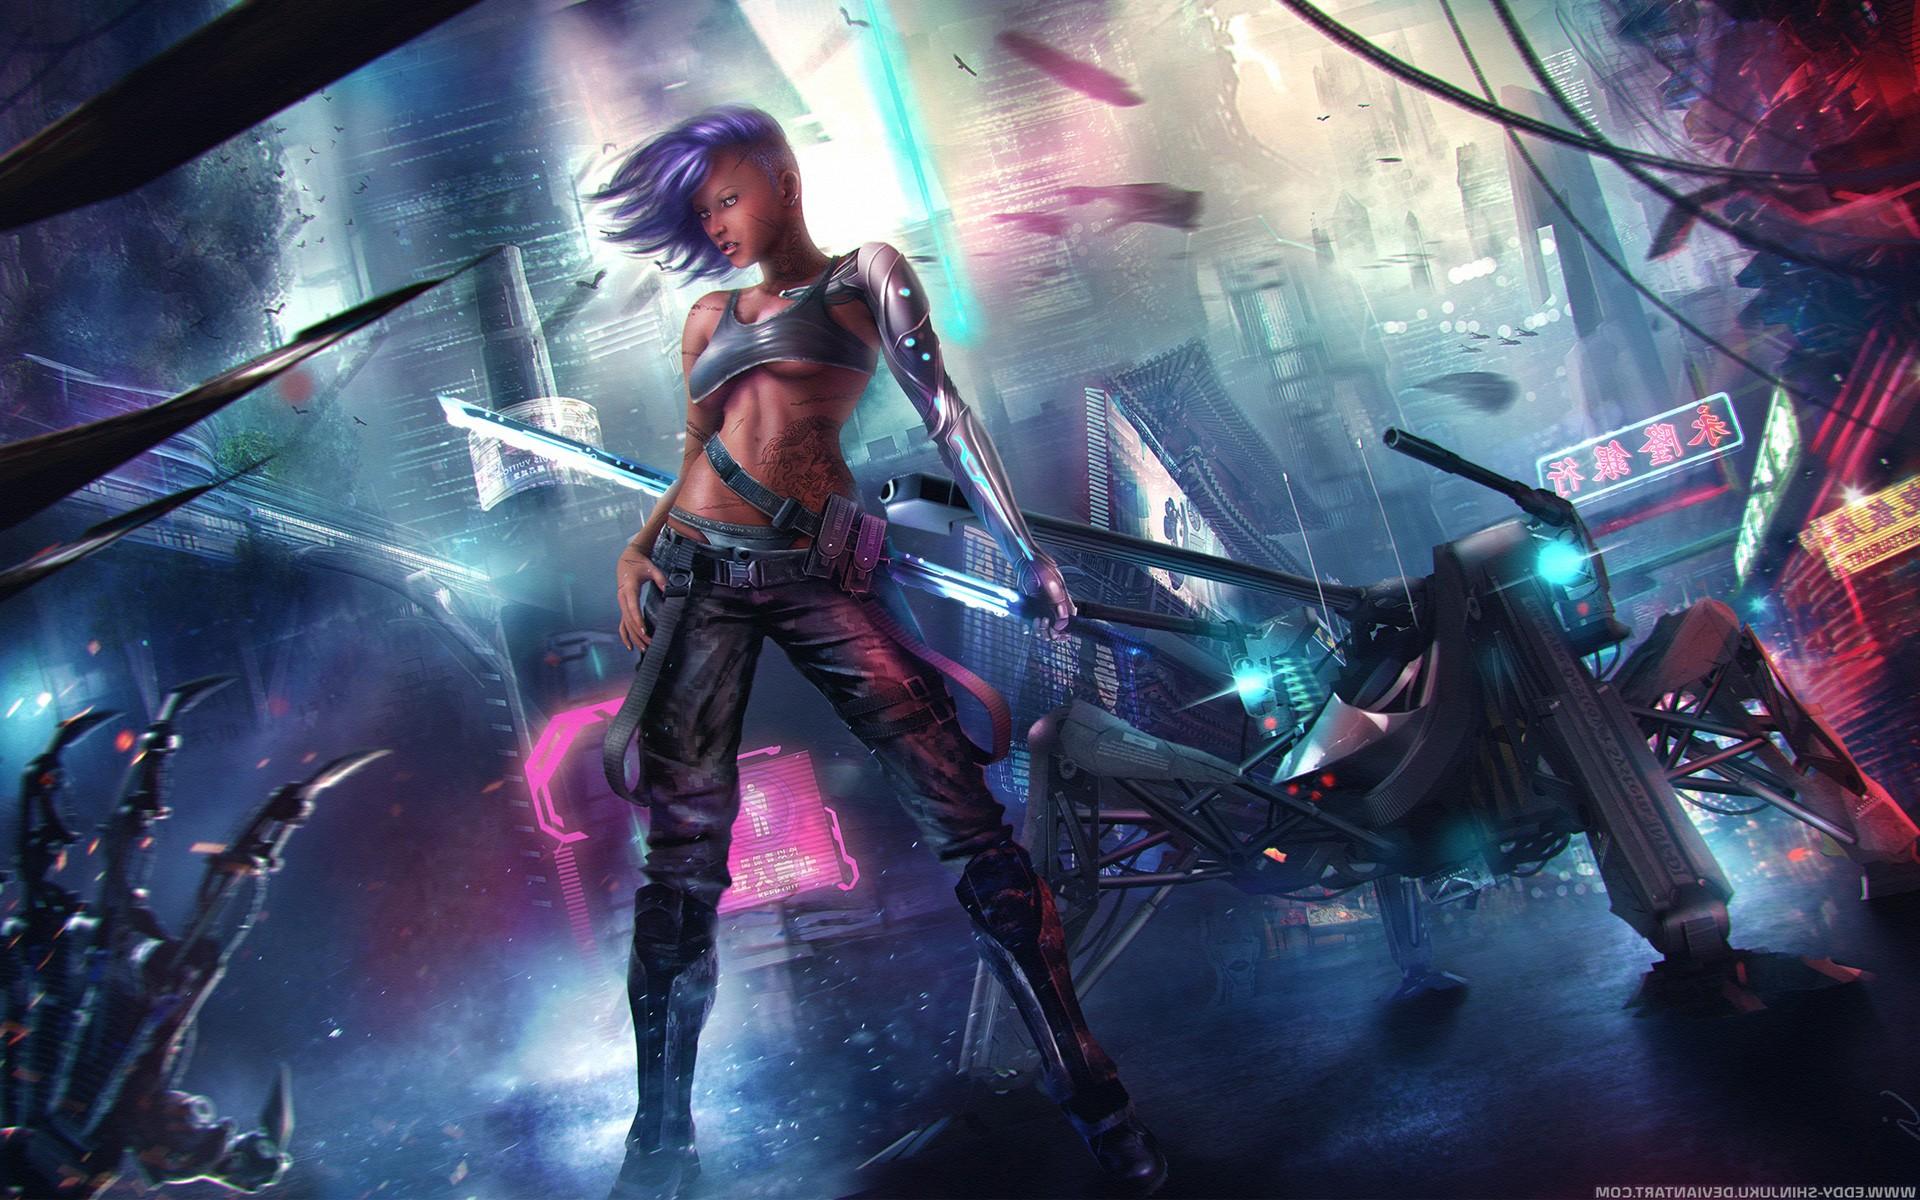 Asian Cyberpunk HD Fantasy Girls 4k Wallpapers Images